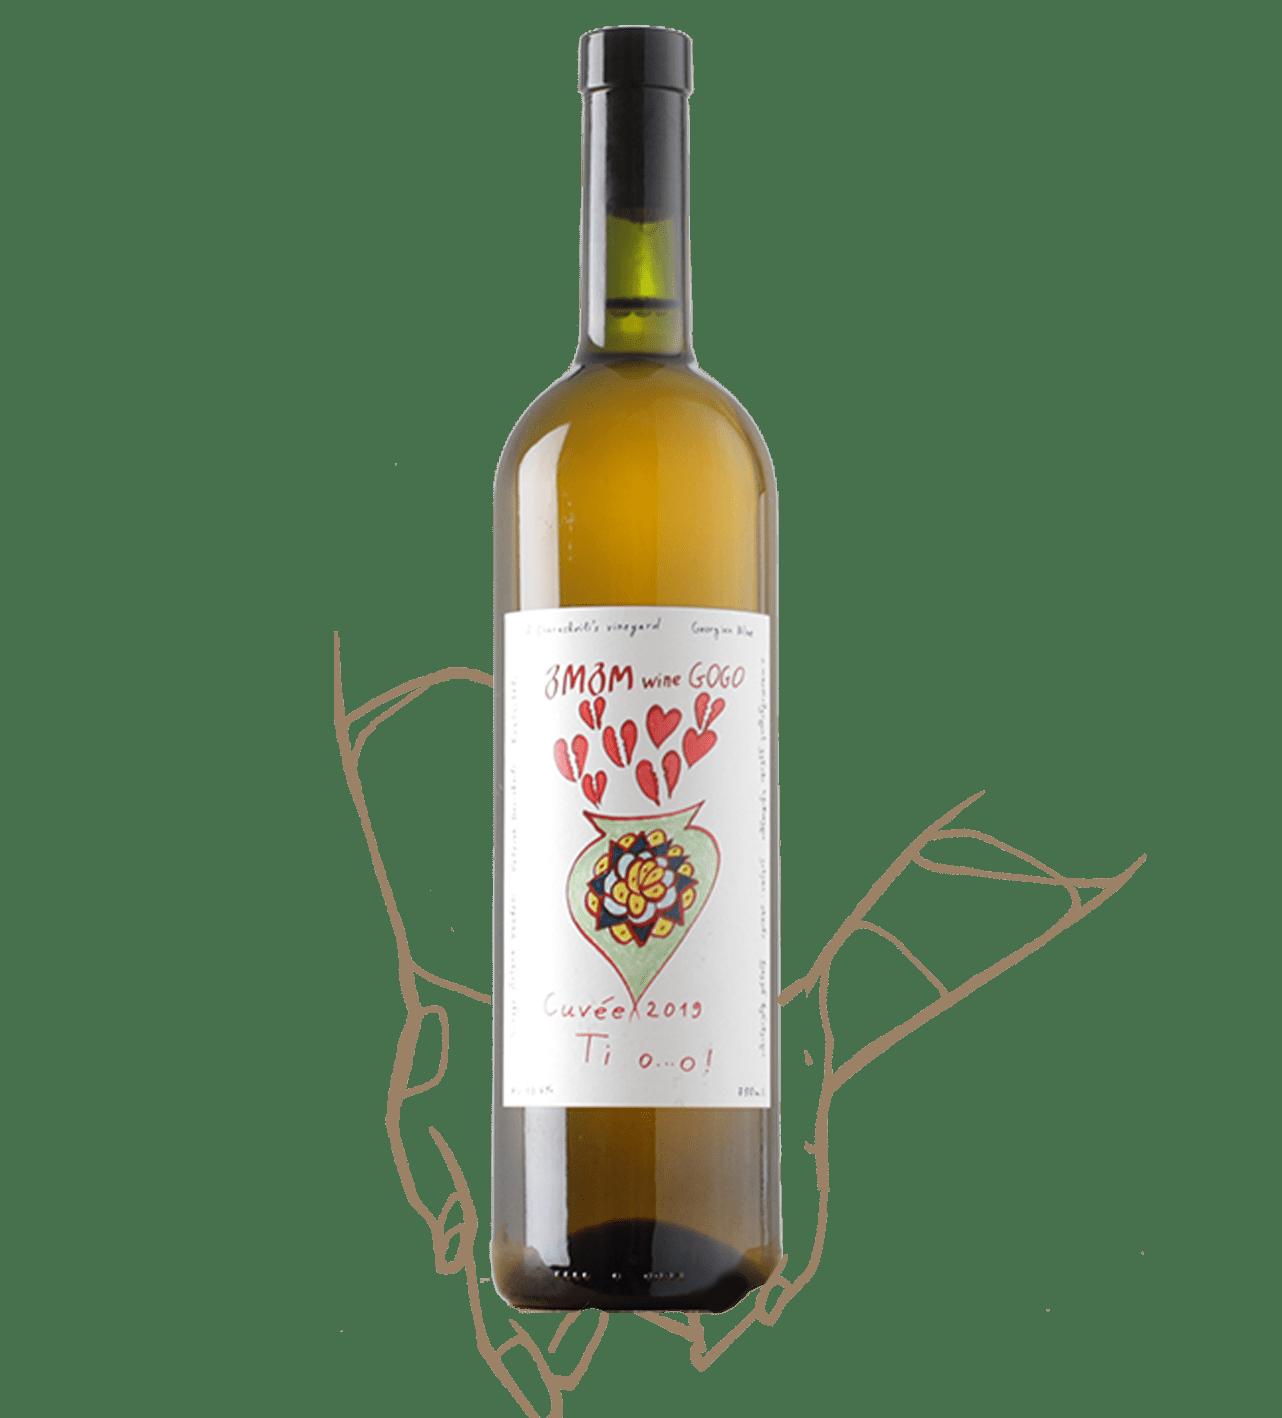 Ti o...o! de Gogo Wine Ketevan Berishvili) est un Vin naturel géorgie